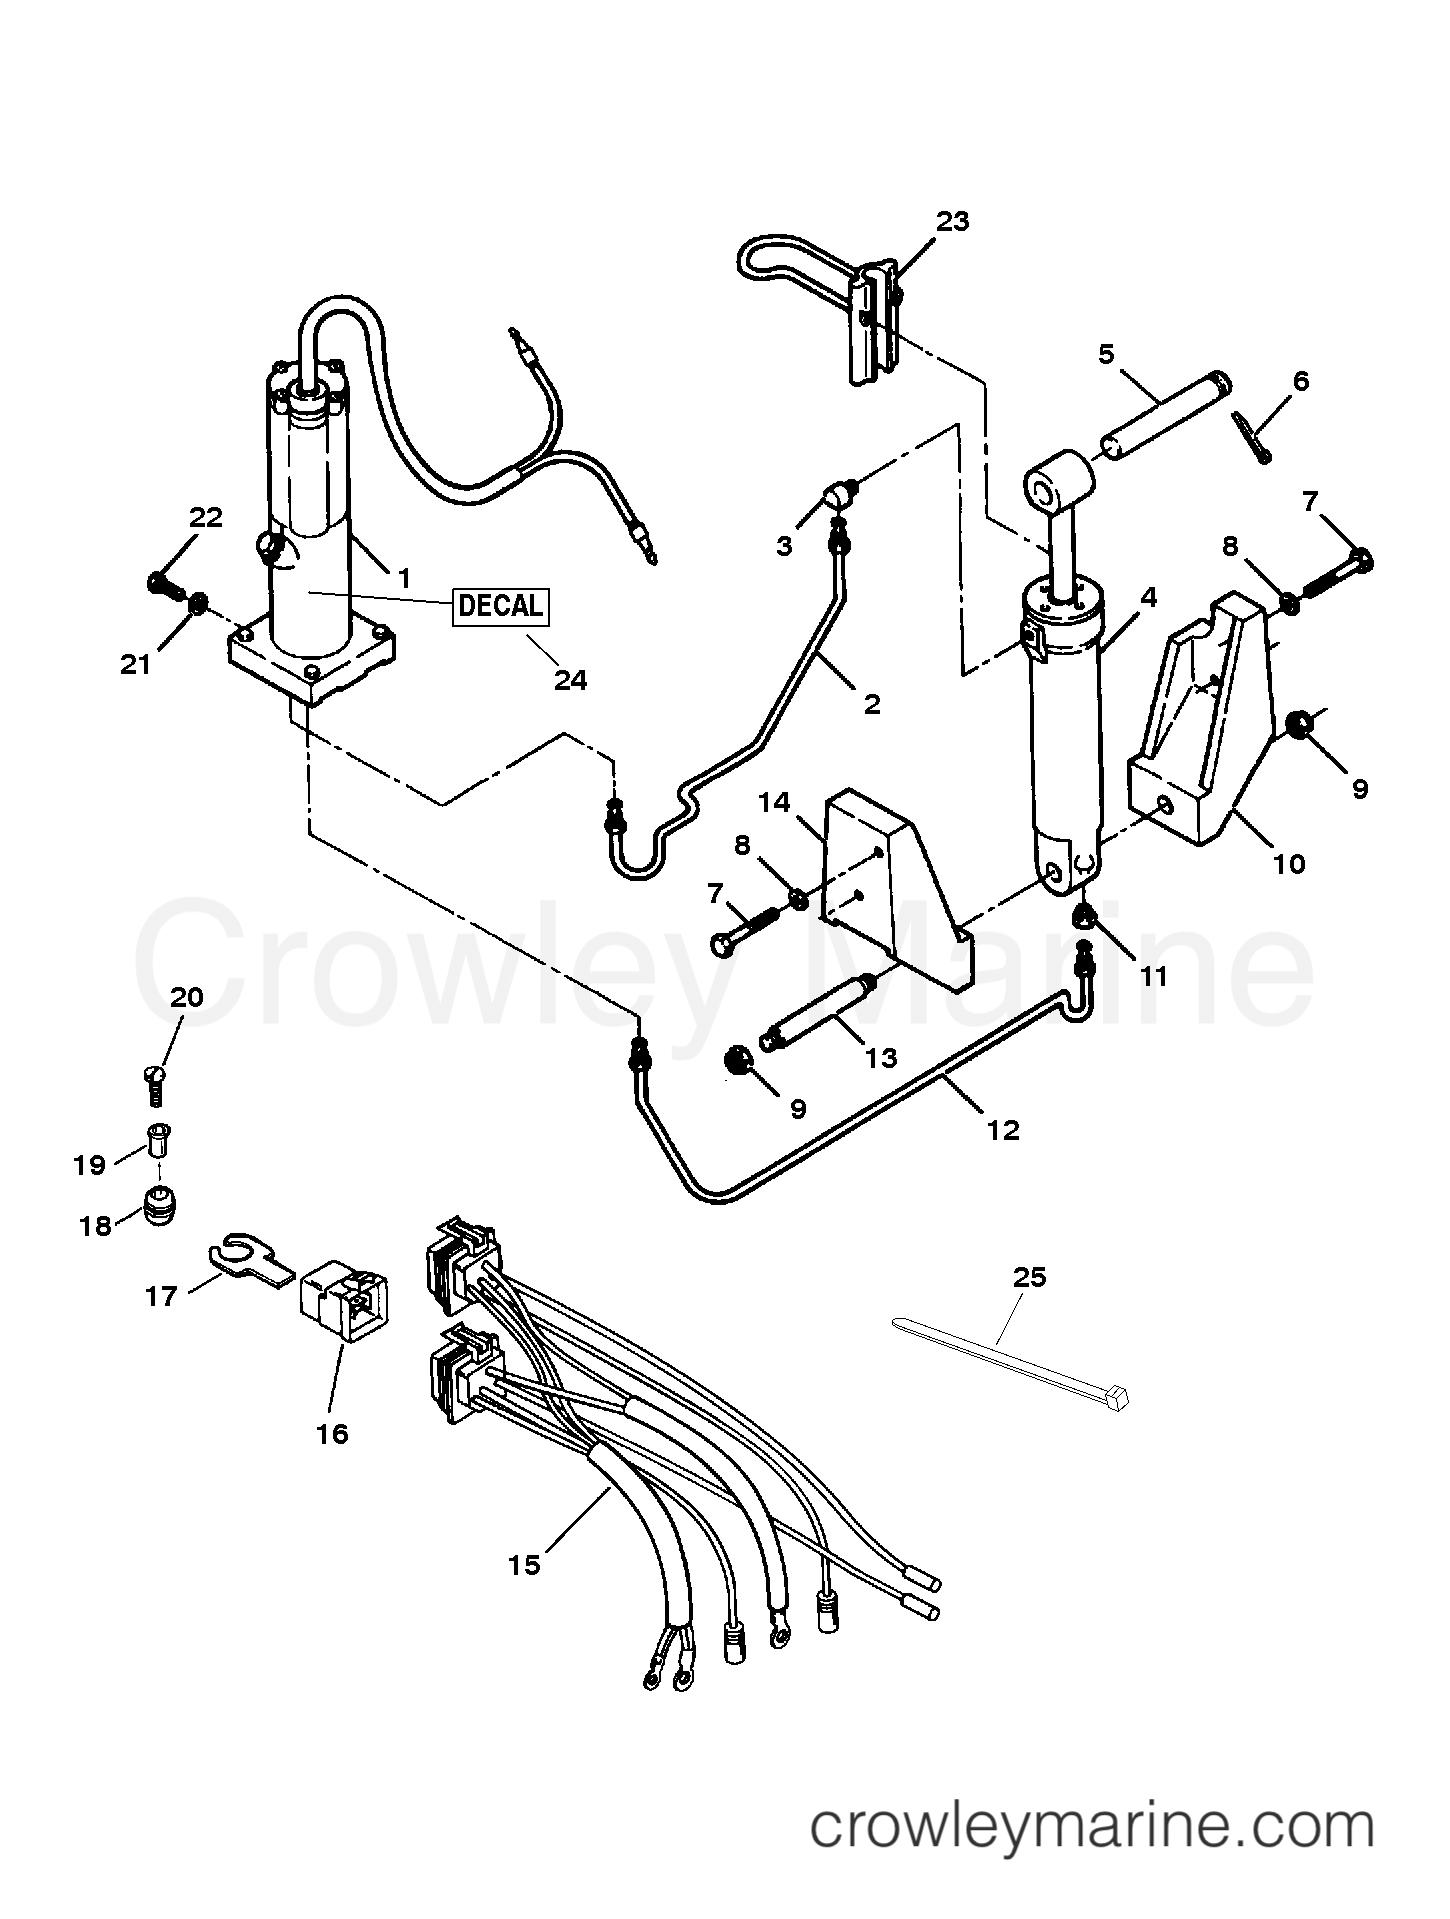 Power Trim And Tilt Unit Design I